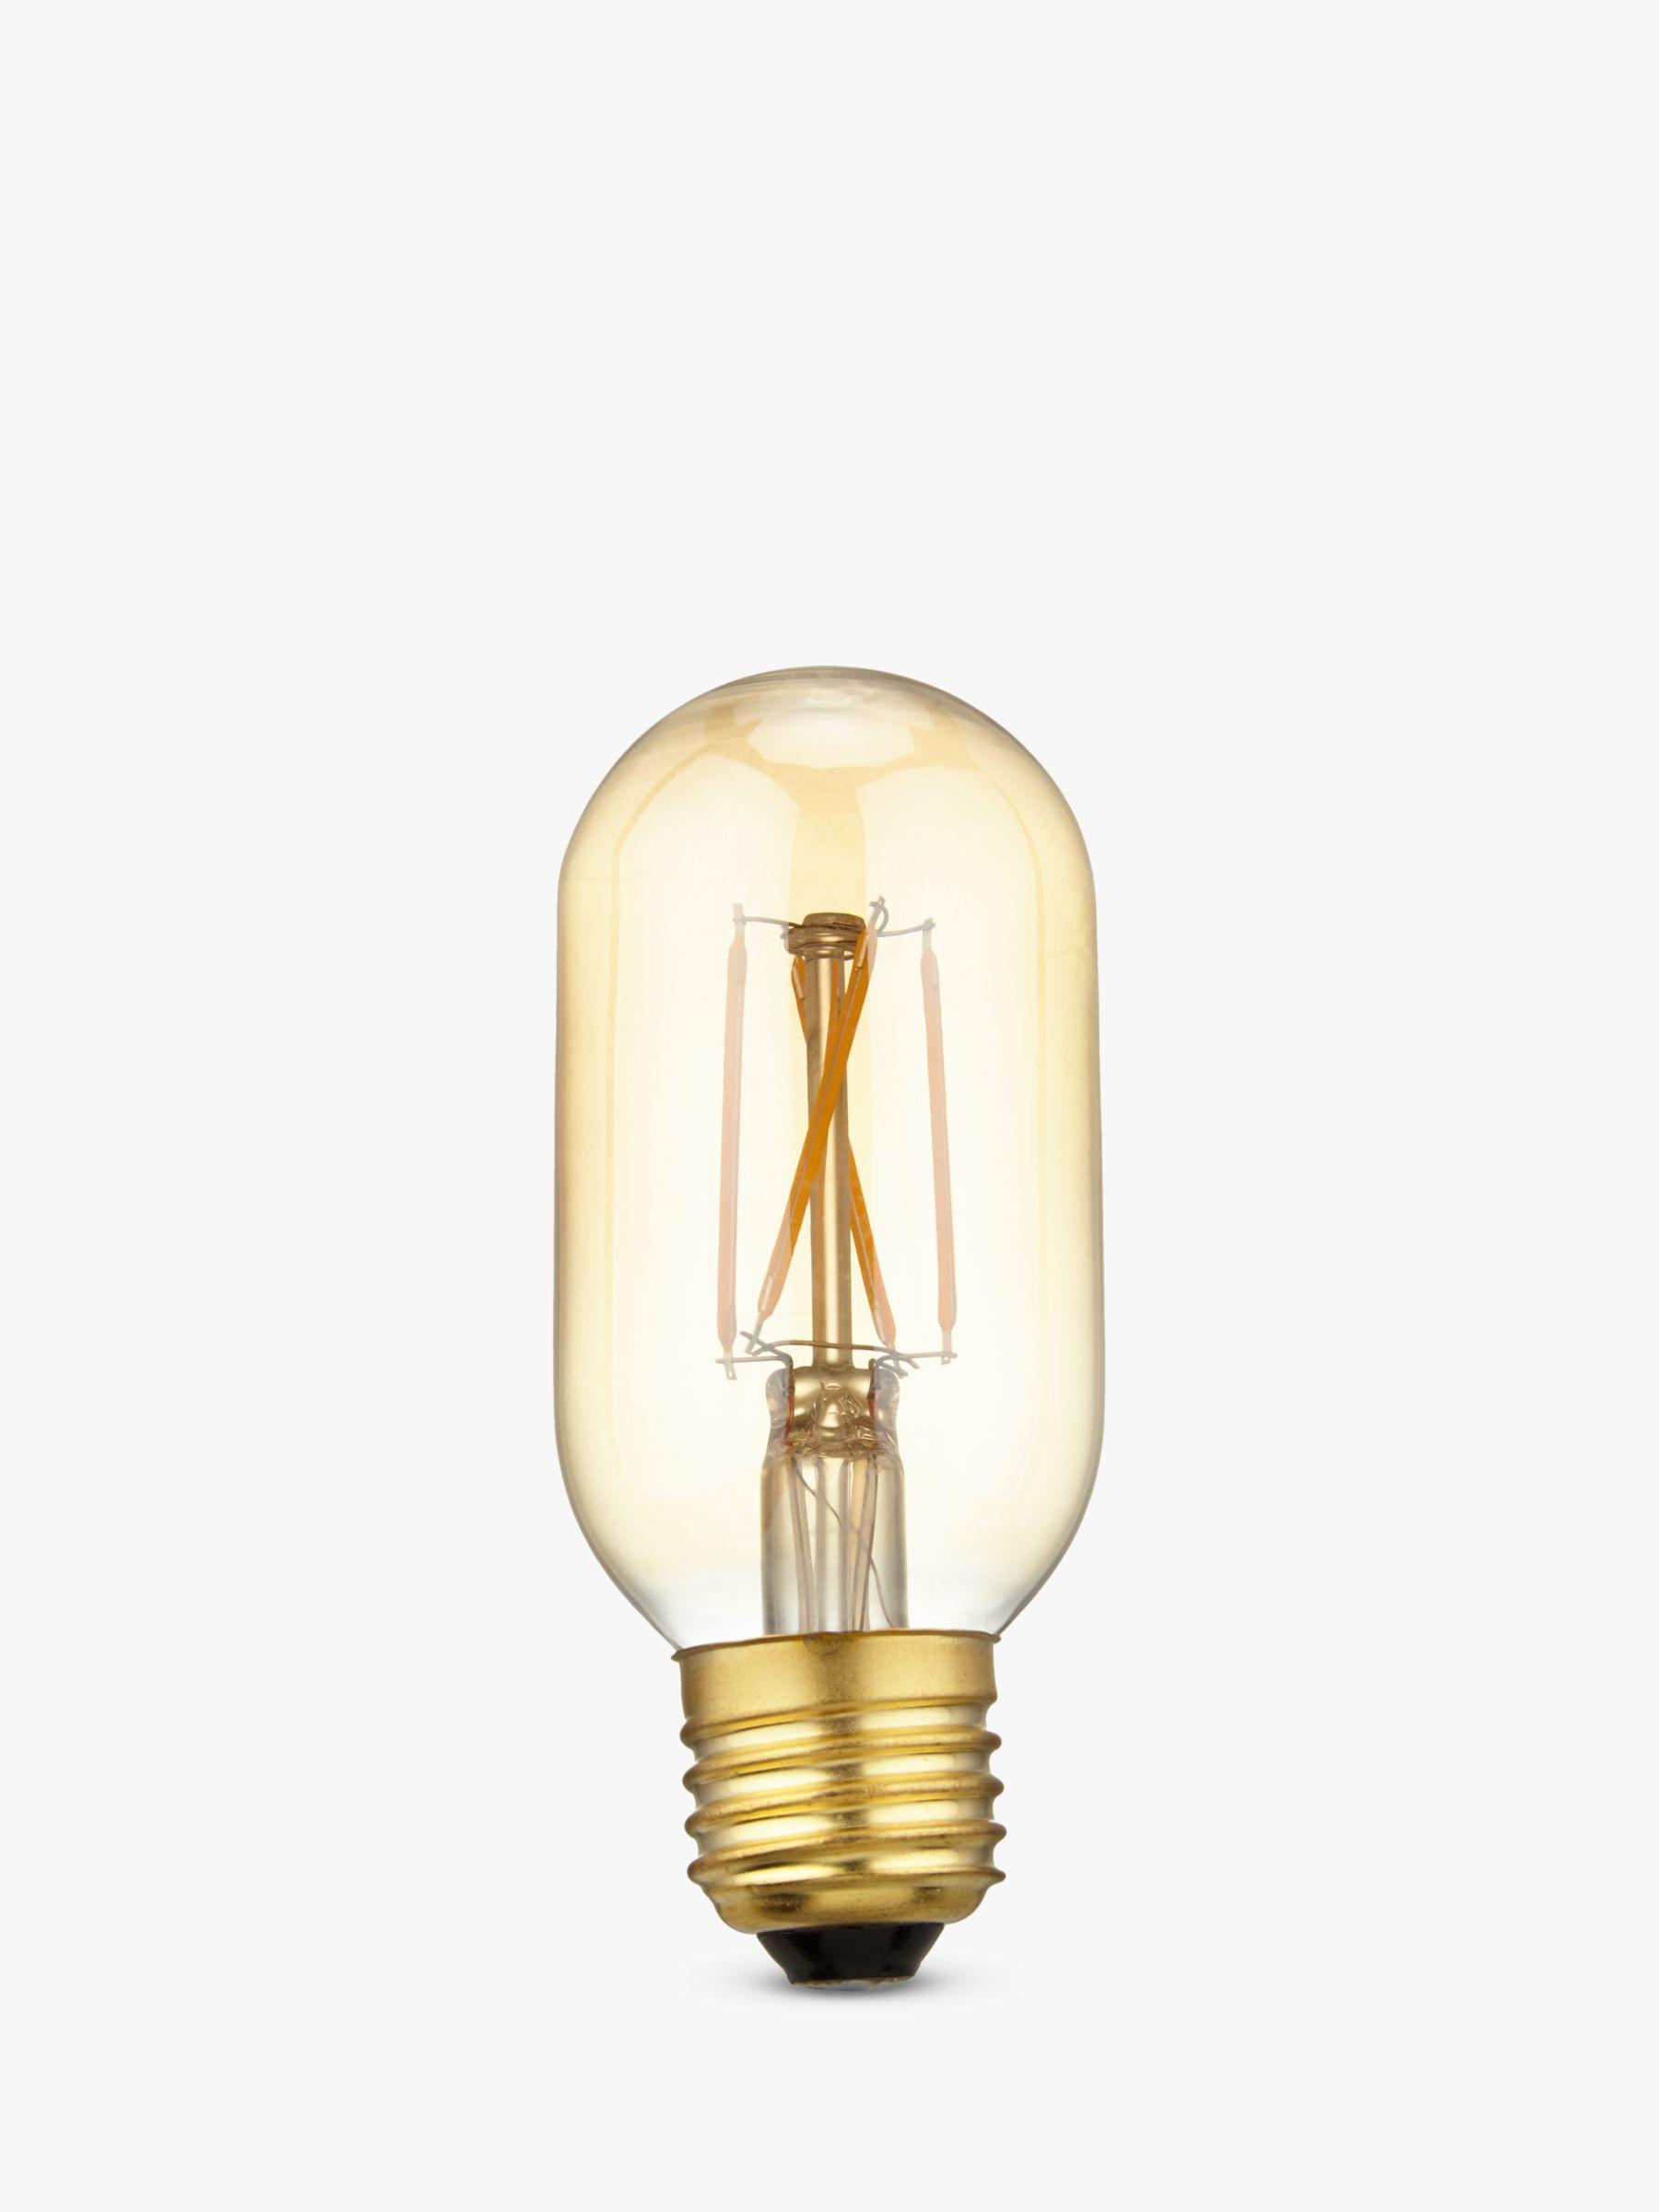 Calex Calex 4W Dimmable Tube LED T45L Filament Bulb, Gold